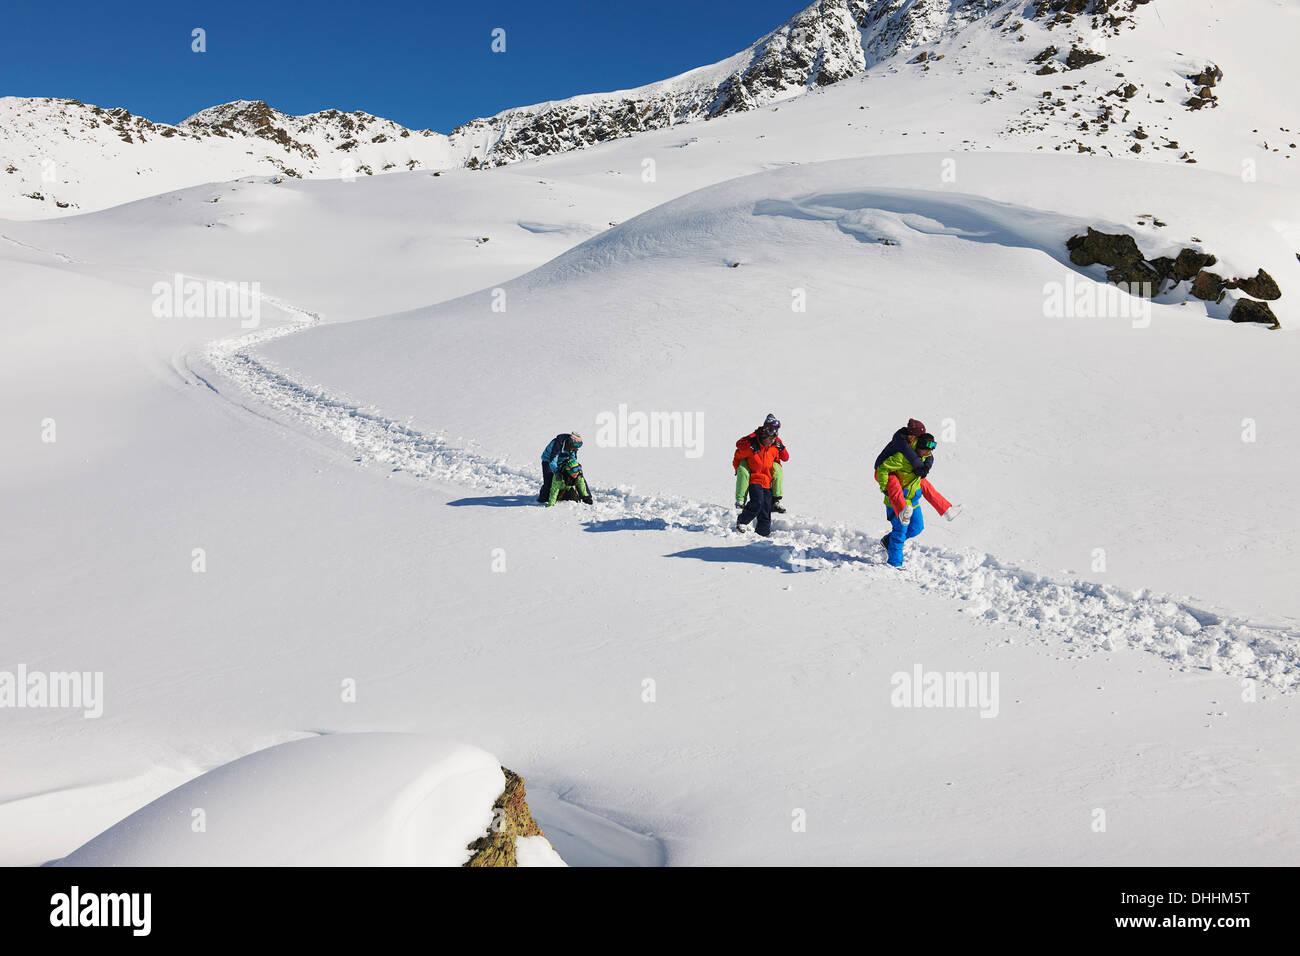 Amigos dándose mutuamente piggy backs en nieve, Kuhtai, Austria Foto de stock